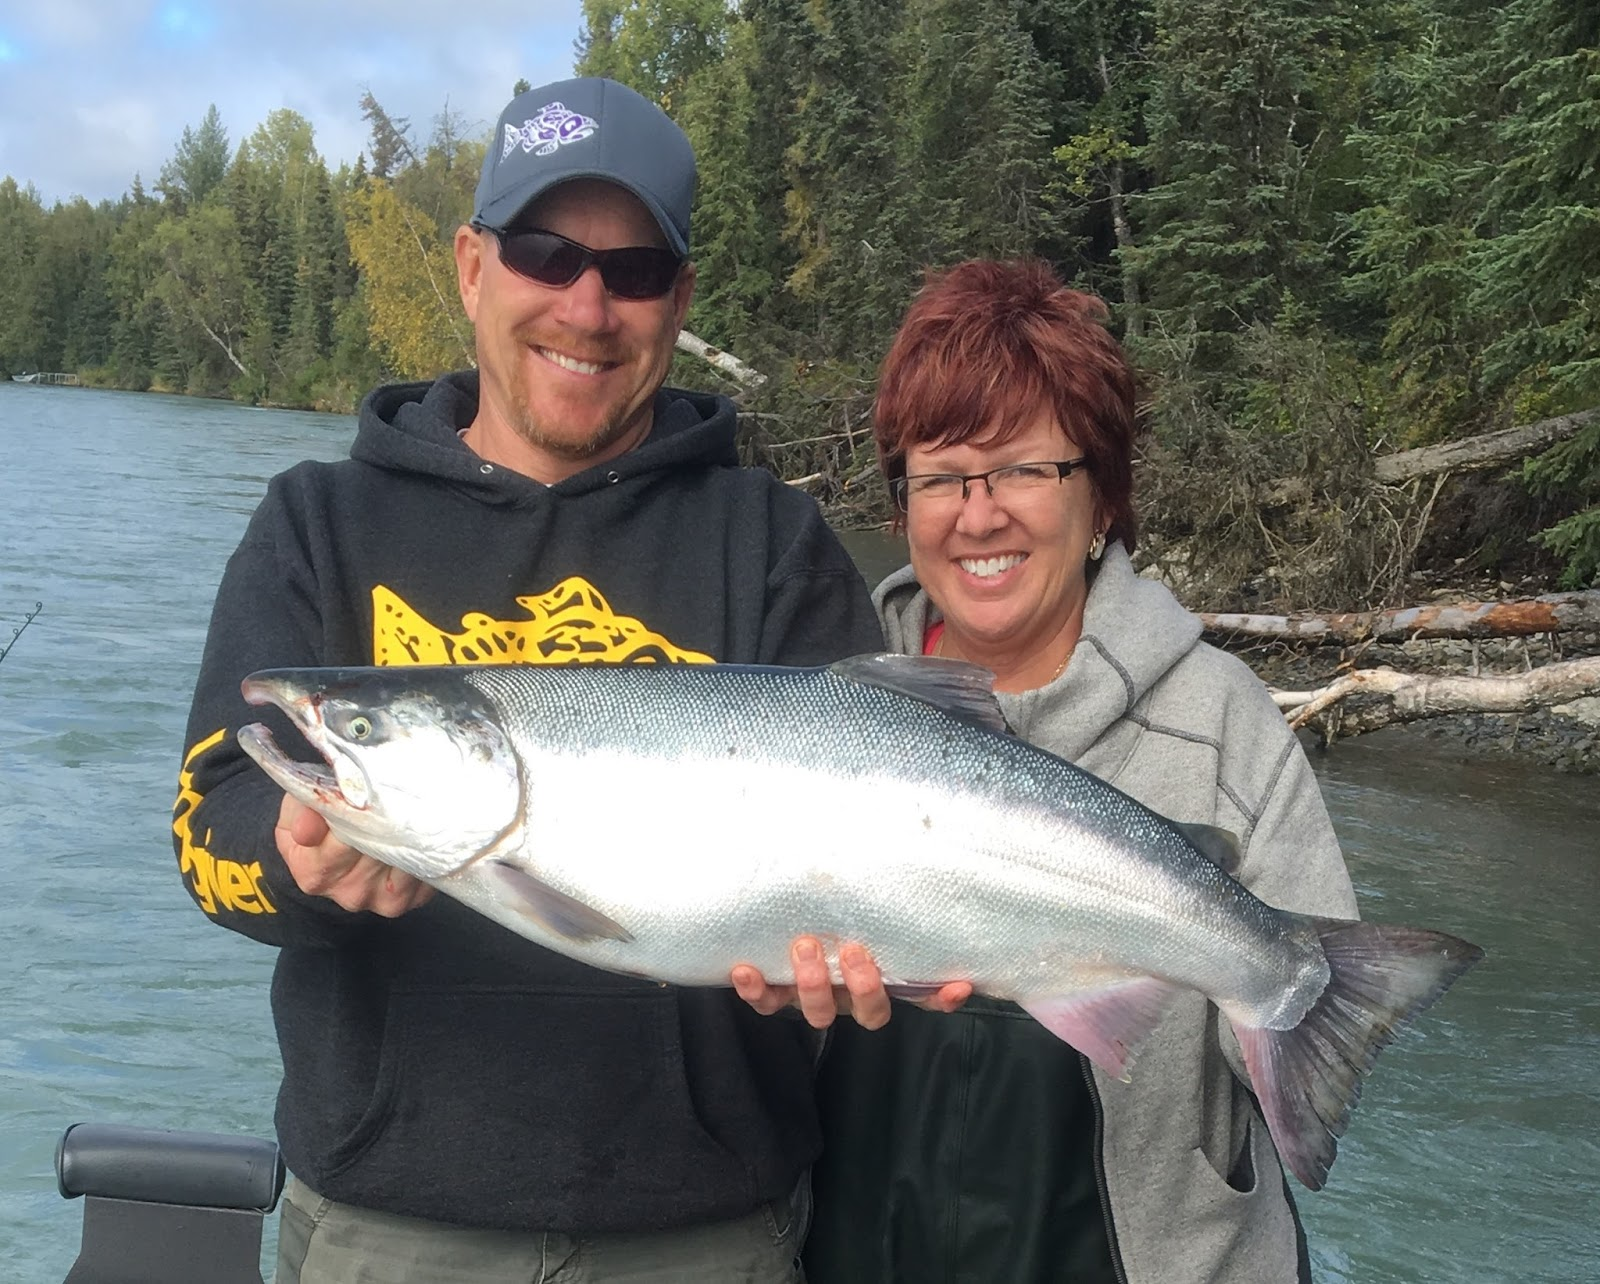 The highlights of jimmie jack 39 s 2016 summer fishing season for Salmon fishing season